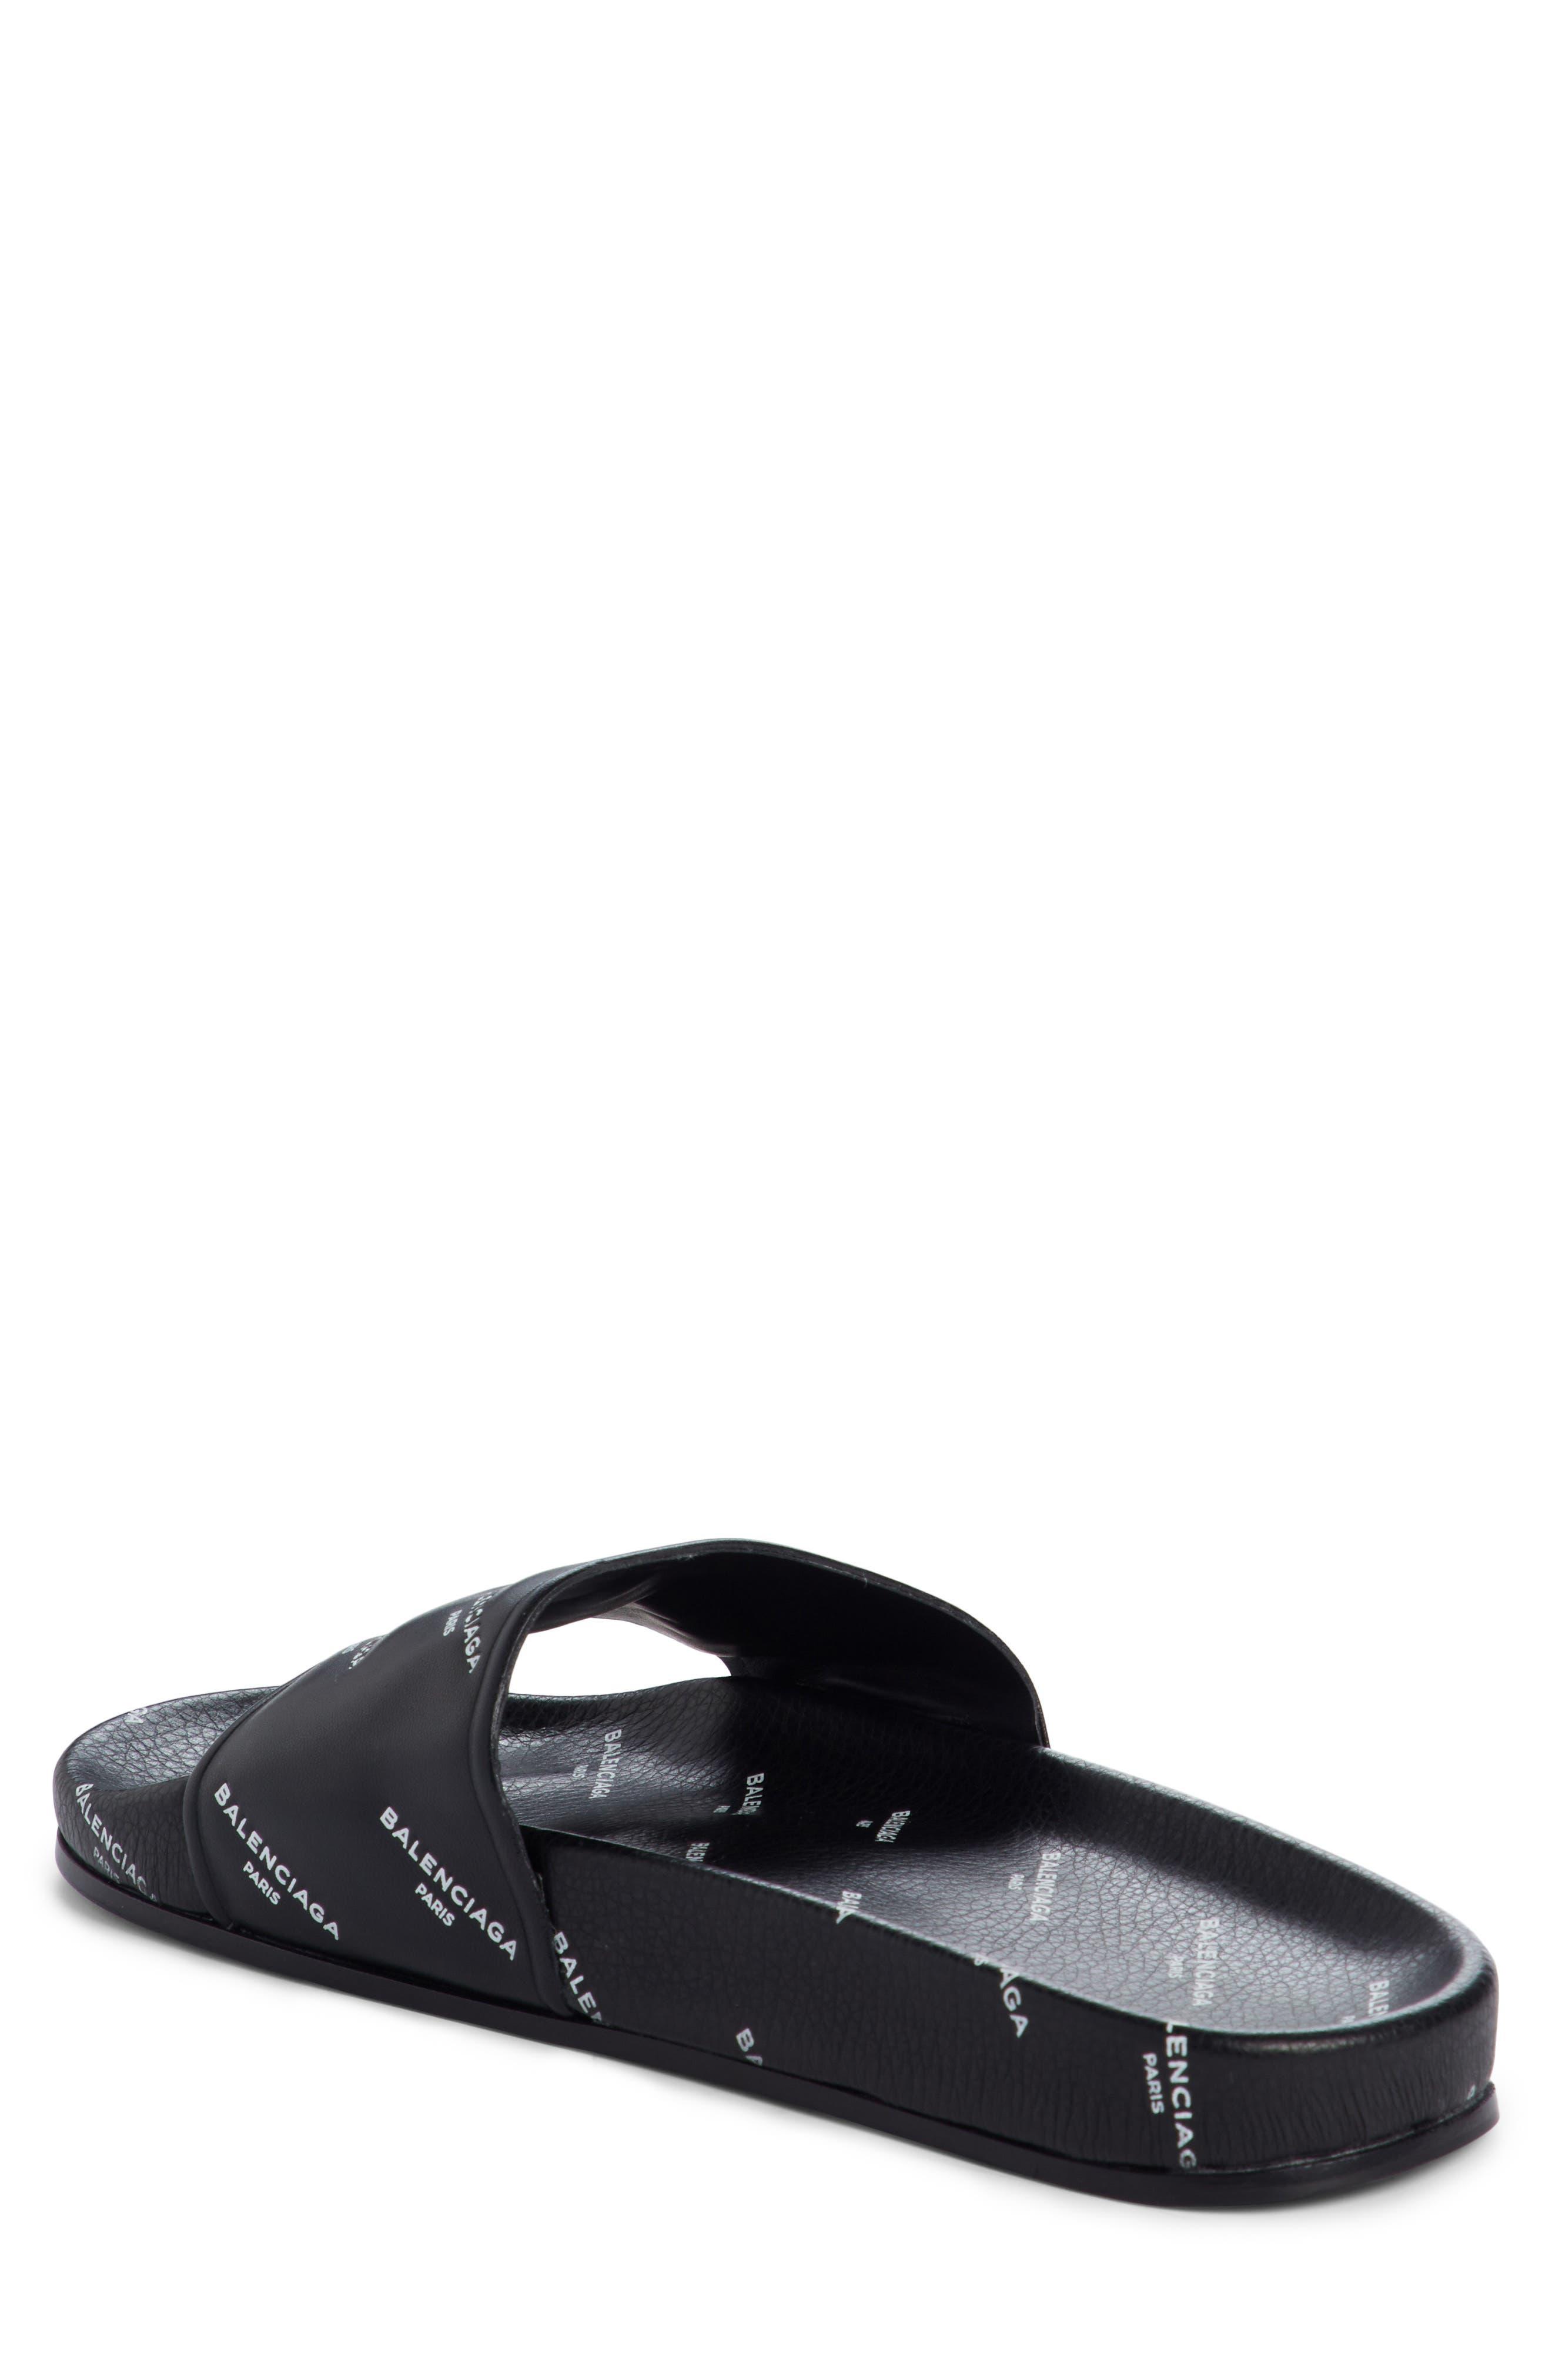 Alternate Image 2  - Balenciaga Logo Print Slide Sandal (Women)